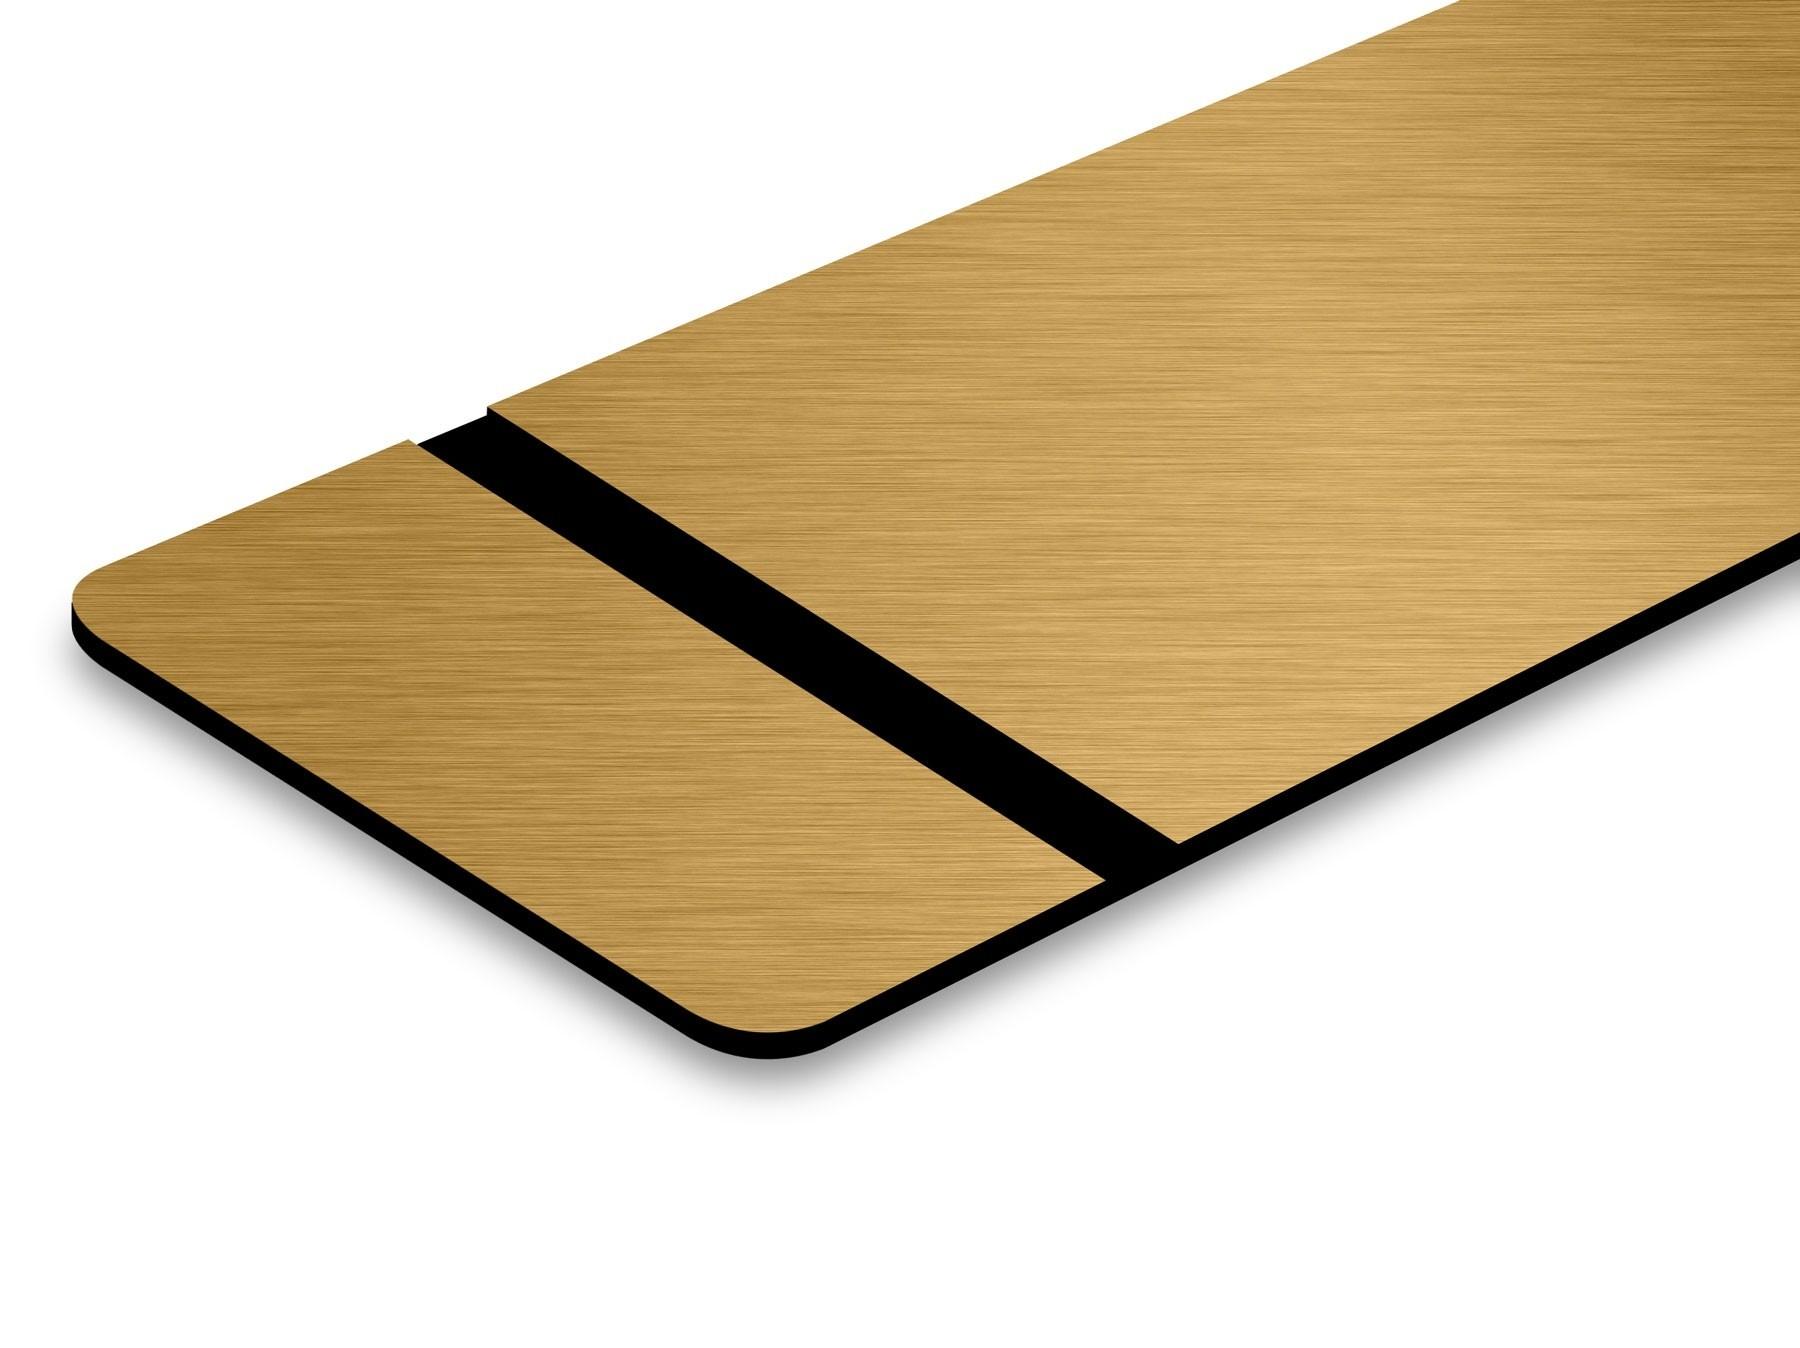 TroLase Thins, Brushed Bronze/Black, 2ply, 0.5 mm